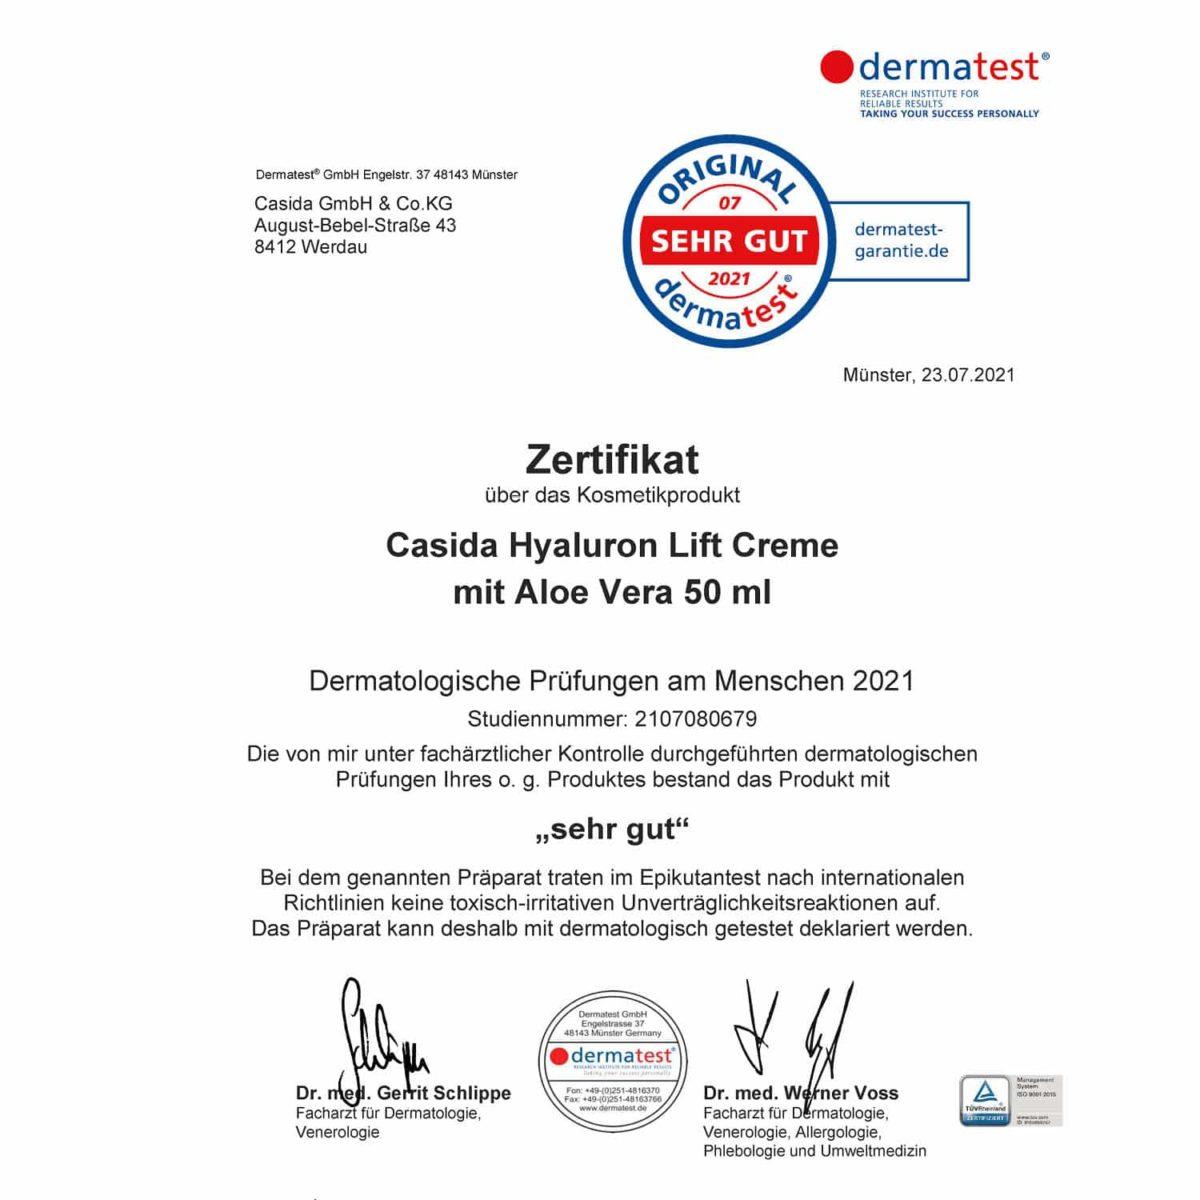 Casida Dermatest Zertifikat Hyaluron Lift Creme